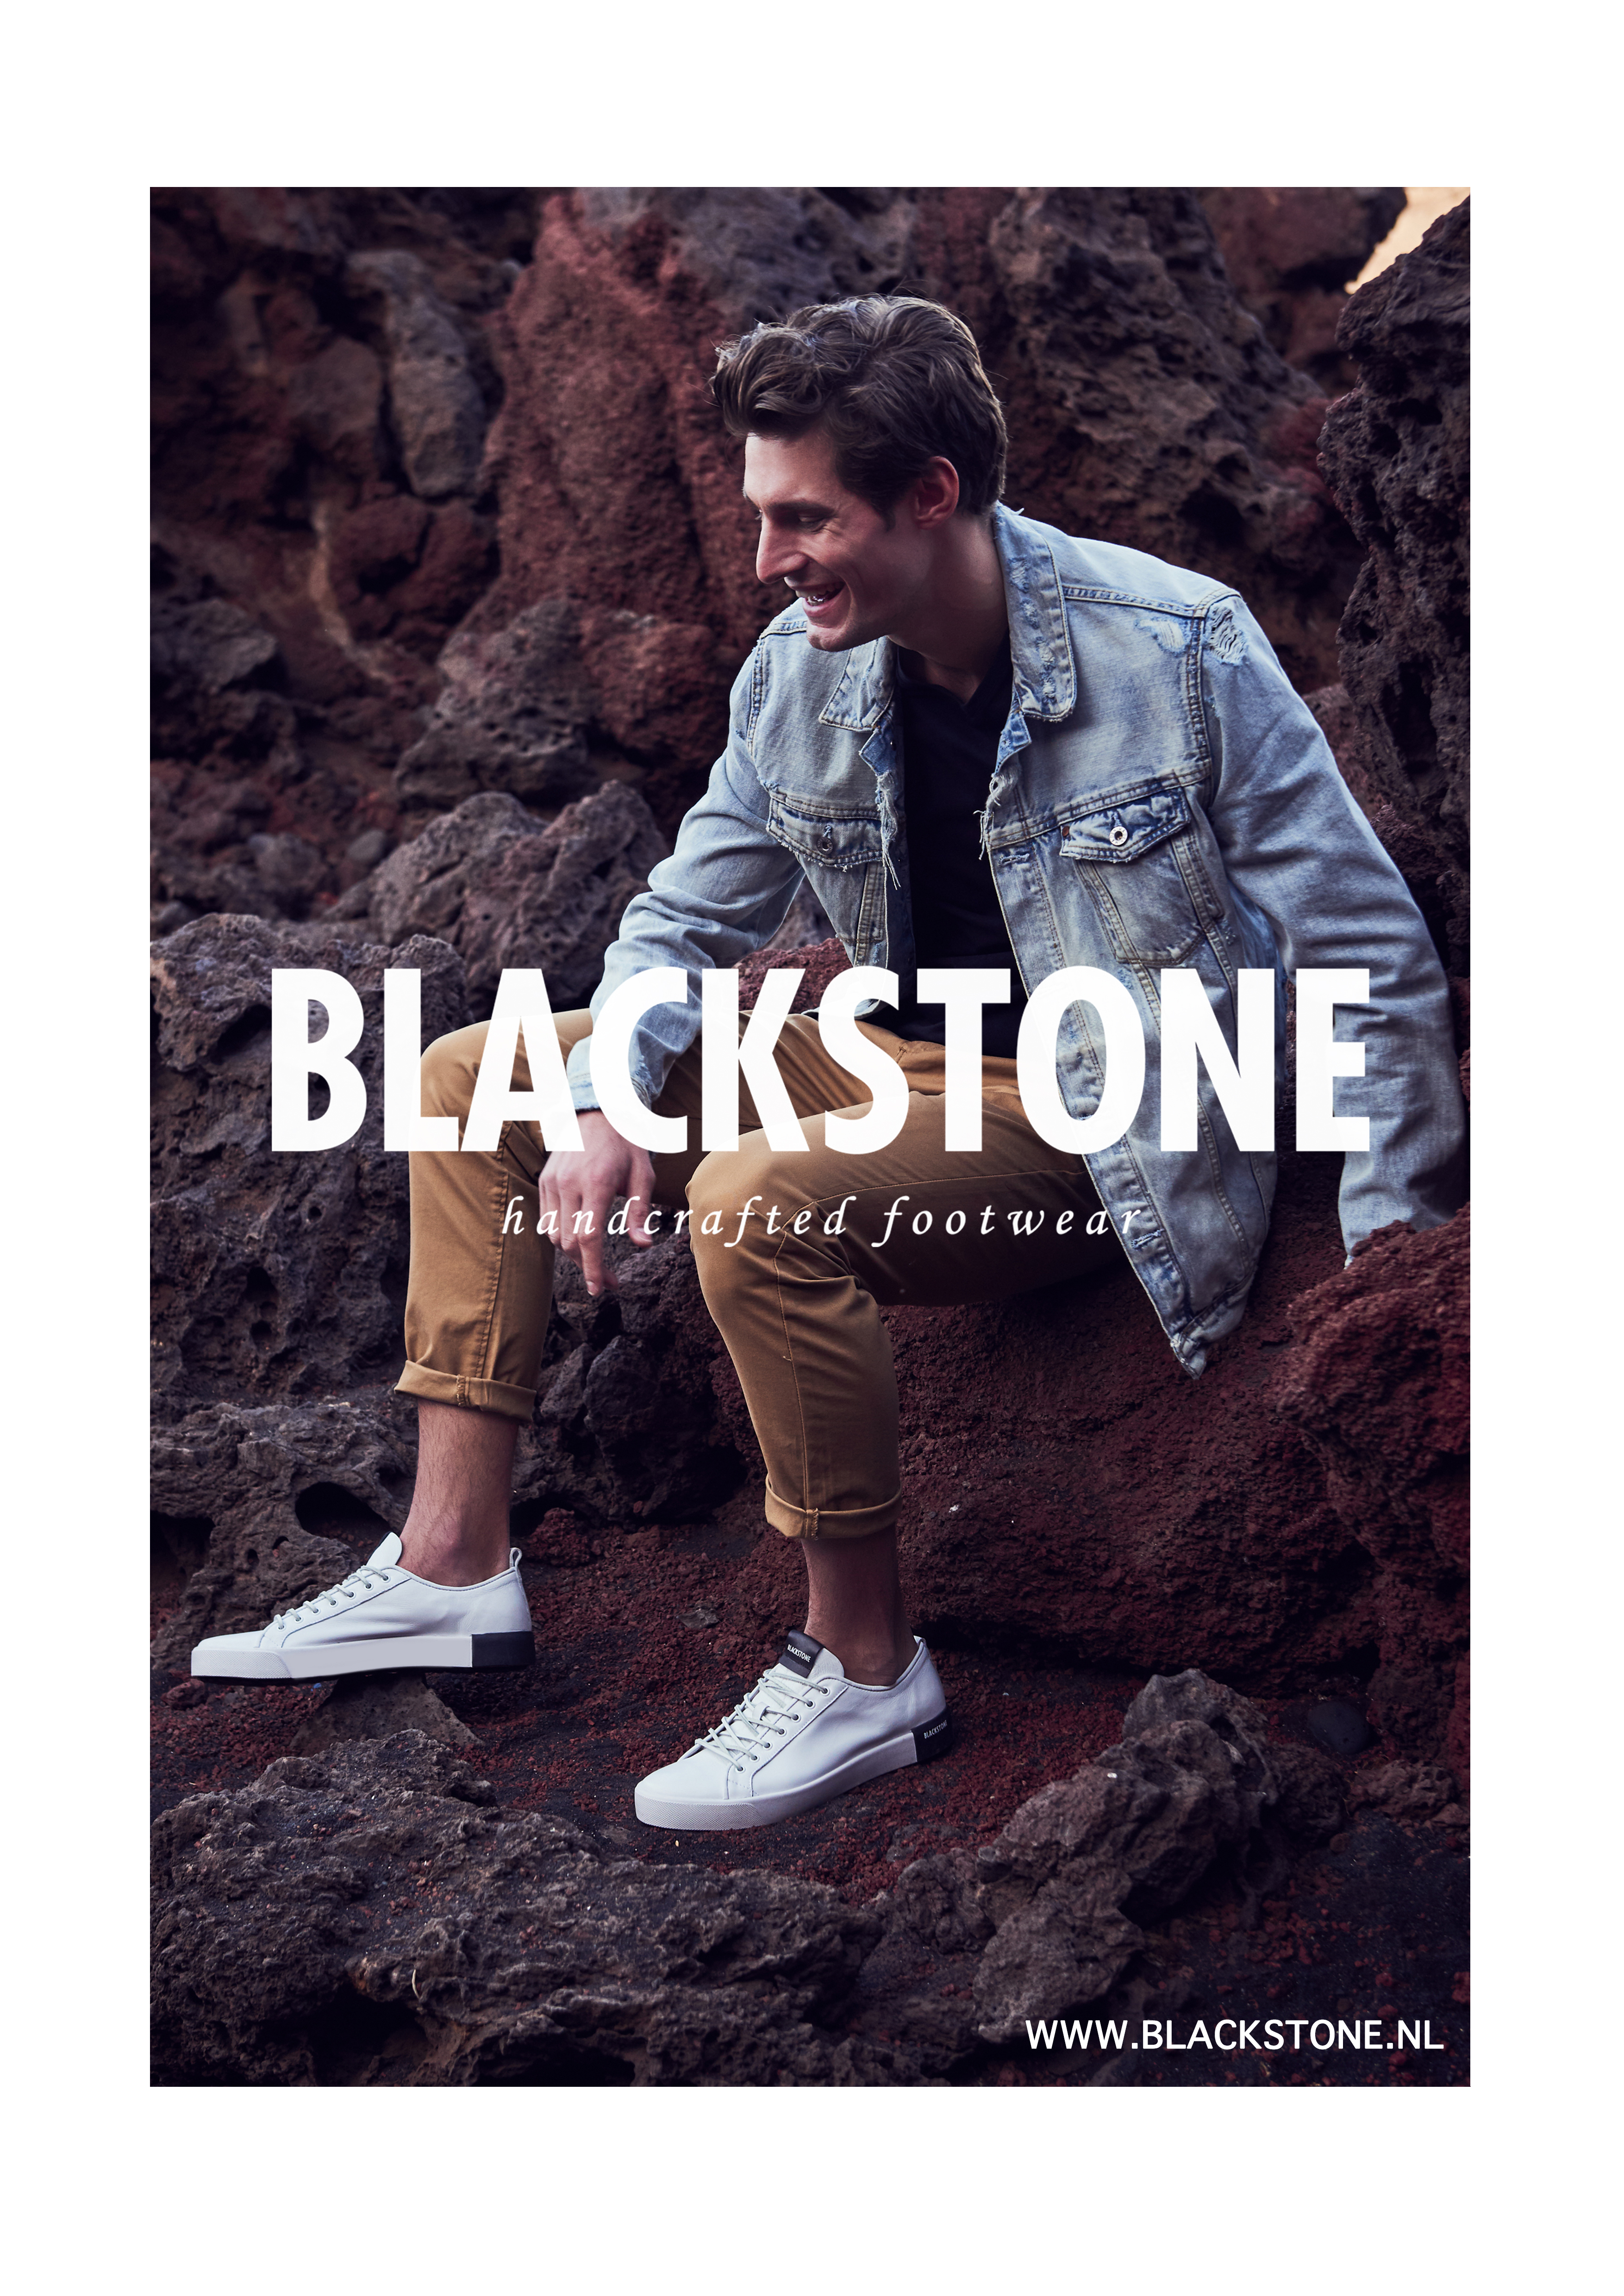 blackstone ad4